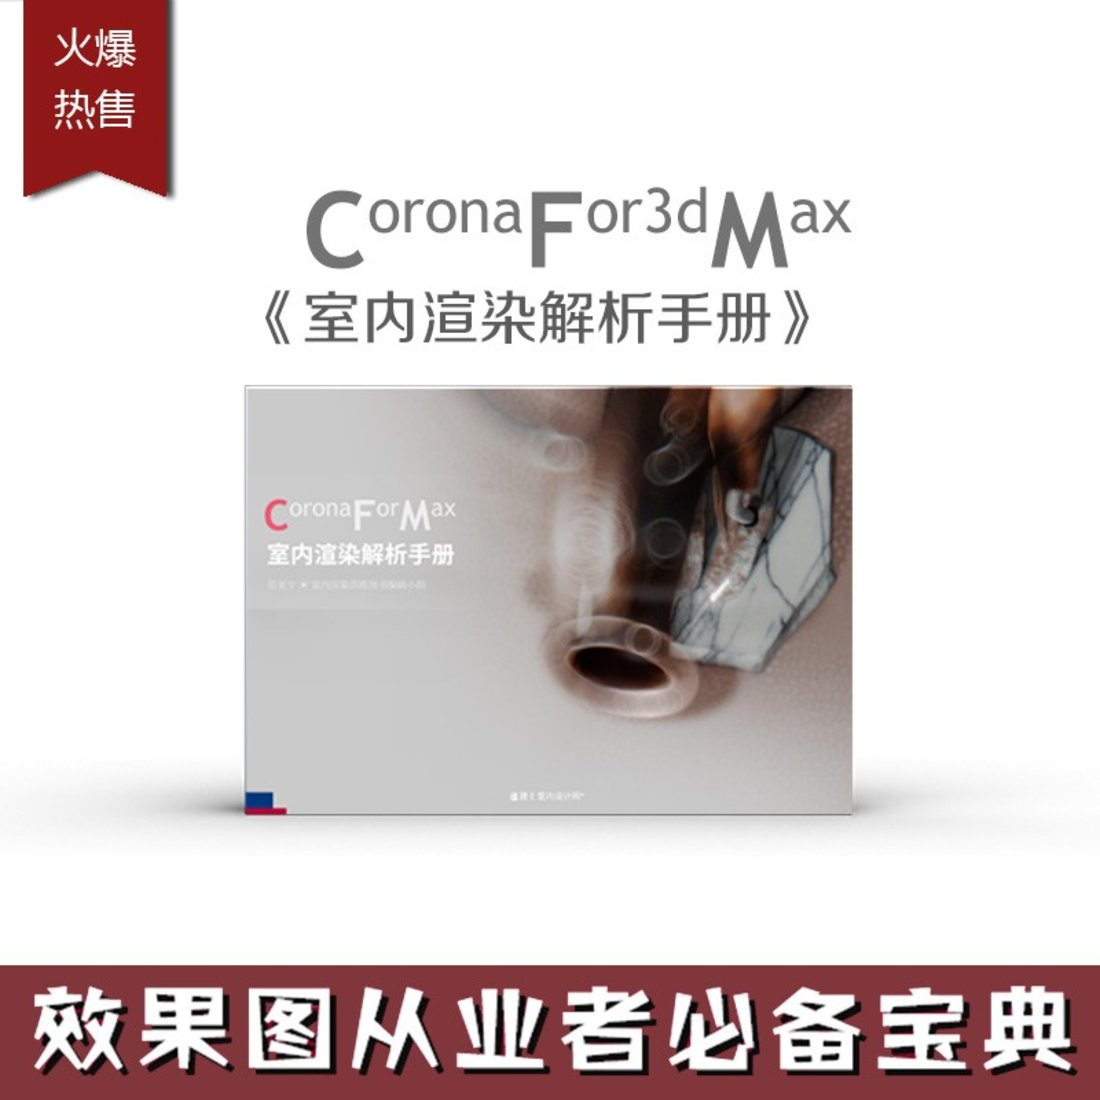 《Corona For 3dMax·室内渲染解析手册》